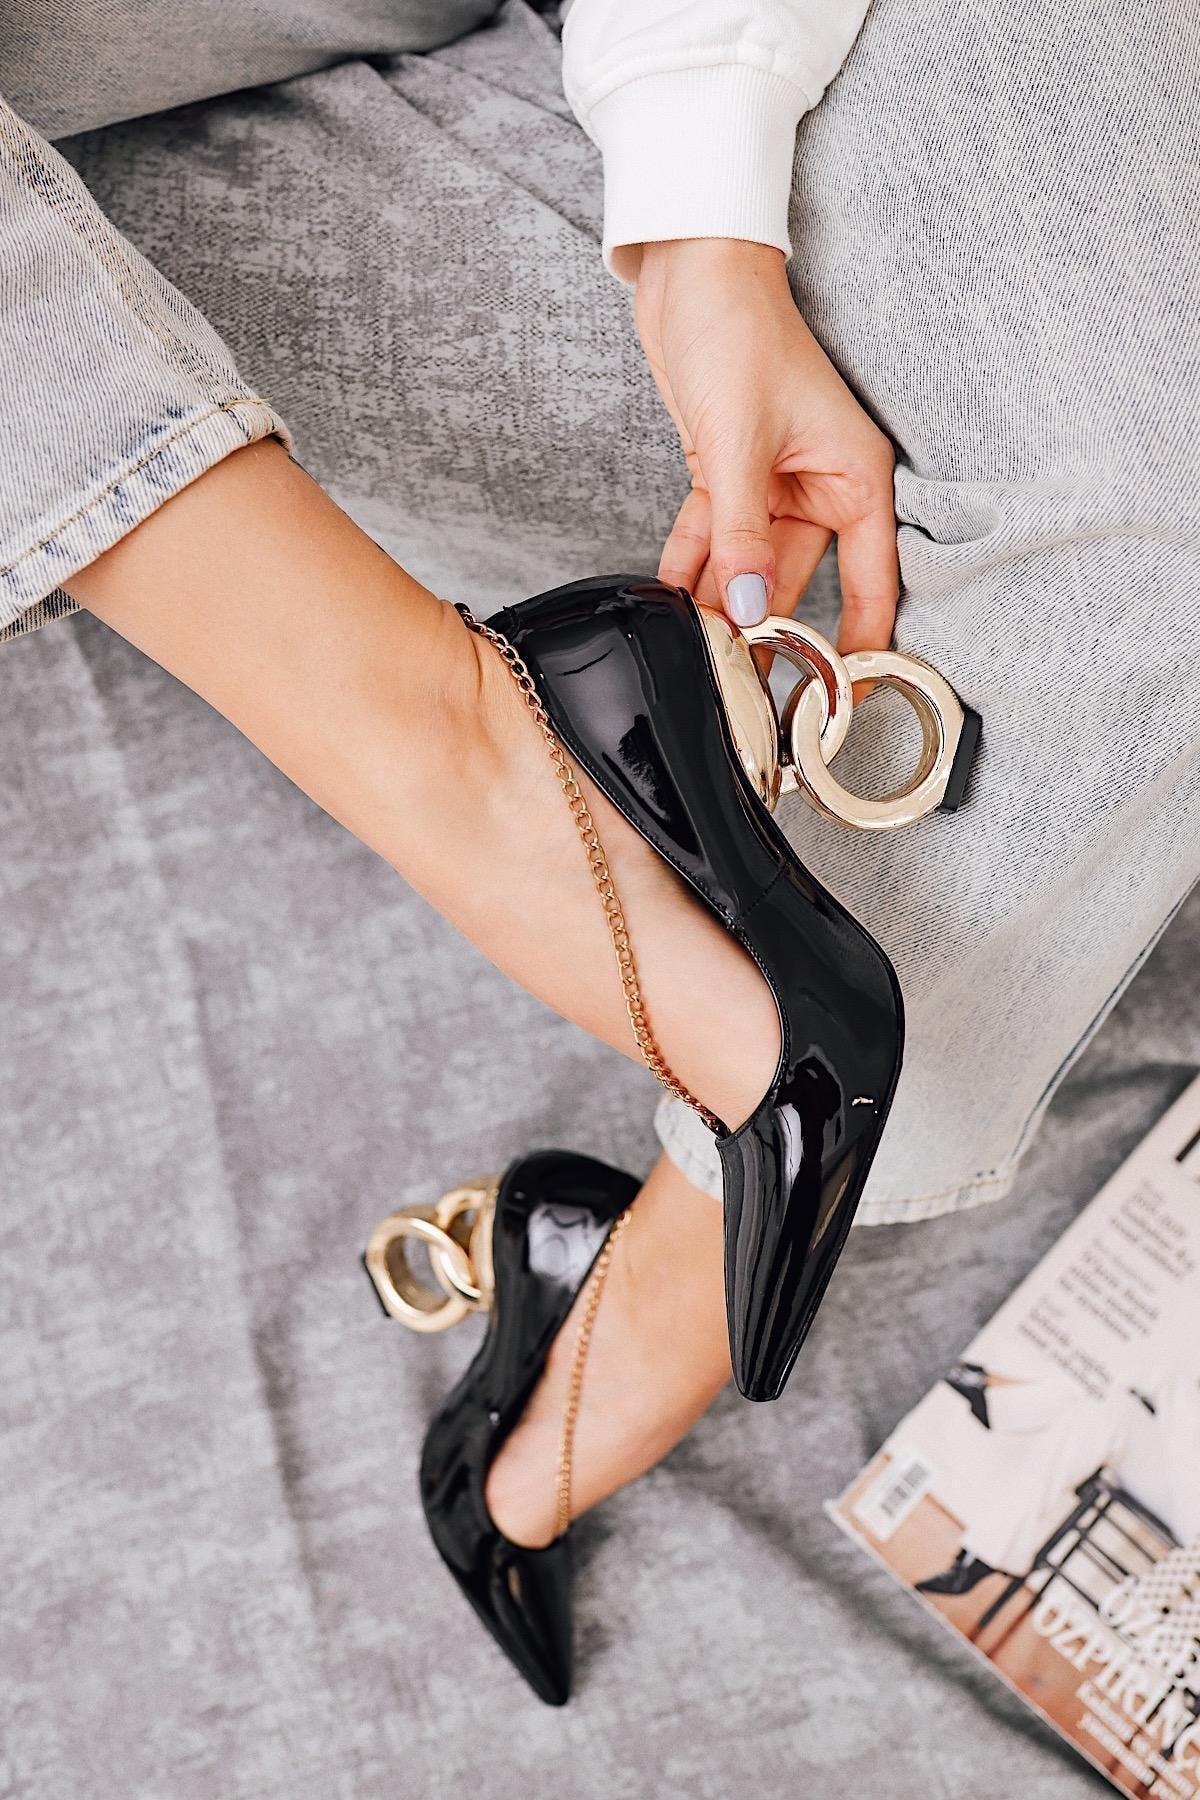 Limoya Elianna Siyah Kırışık Rugan Stiletto ( Zincir Detaylı ) 2